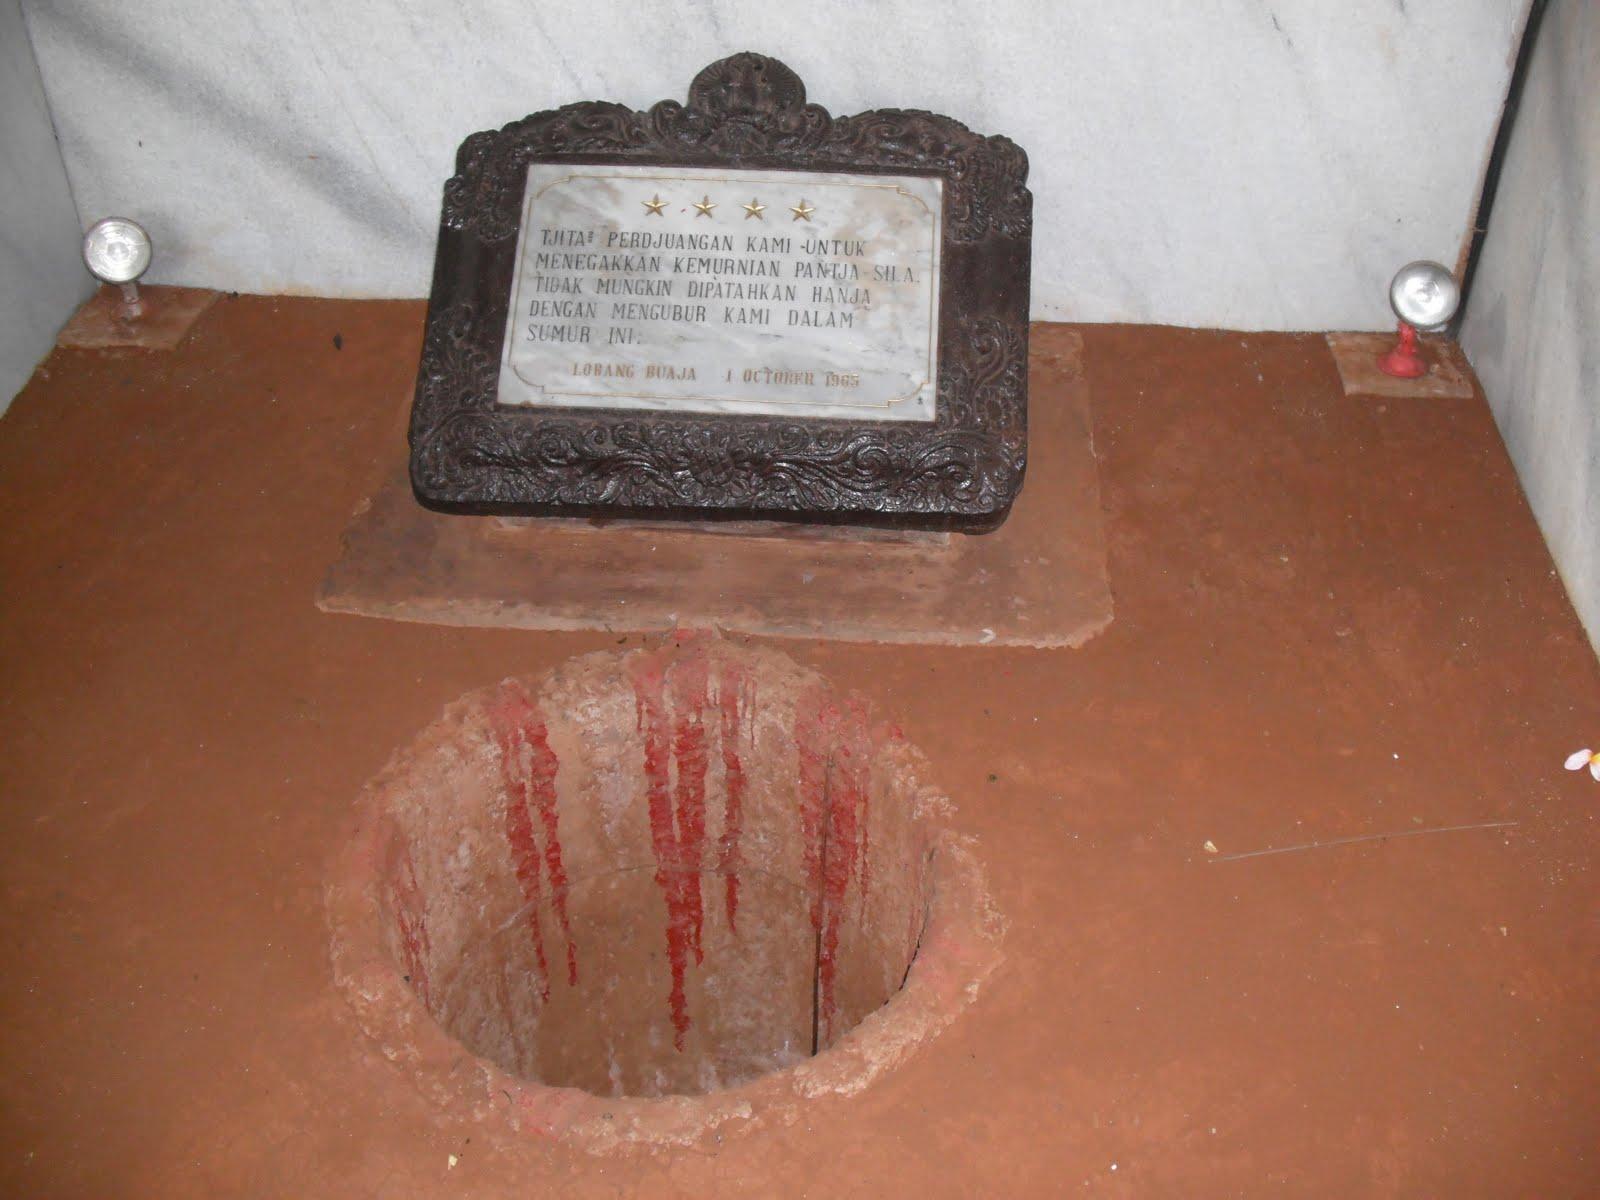 Museum Indonesia Nurayascience Ciri Khusus Lain Terdapat Patung Relief Sembilan